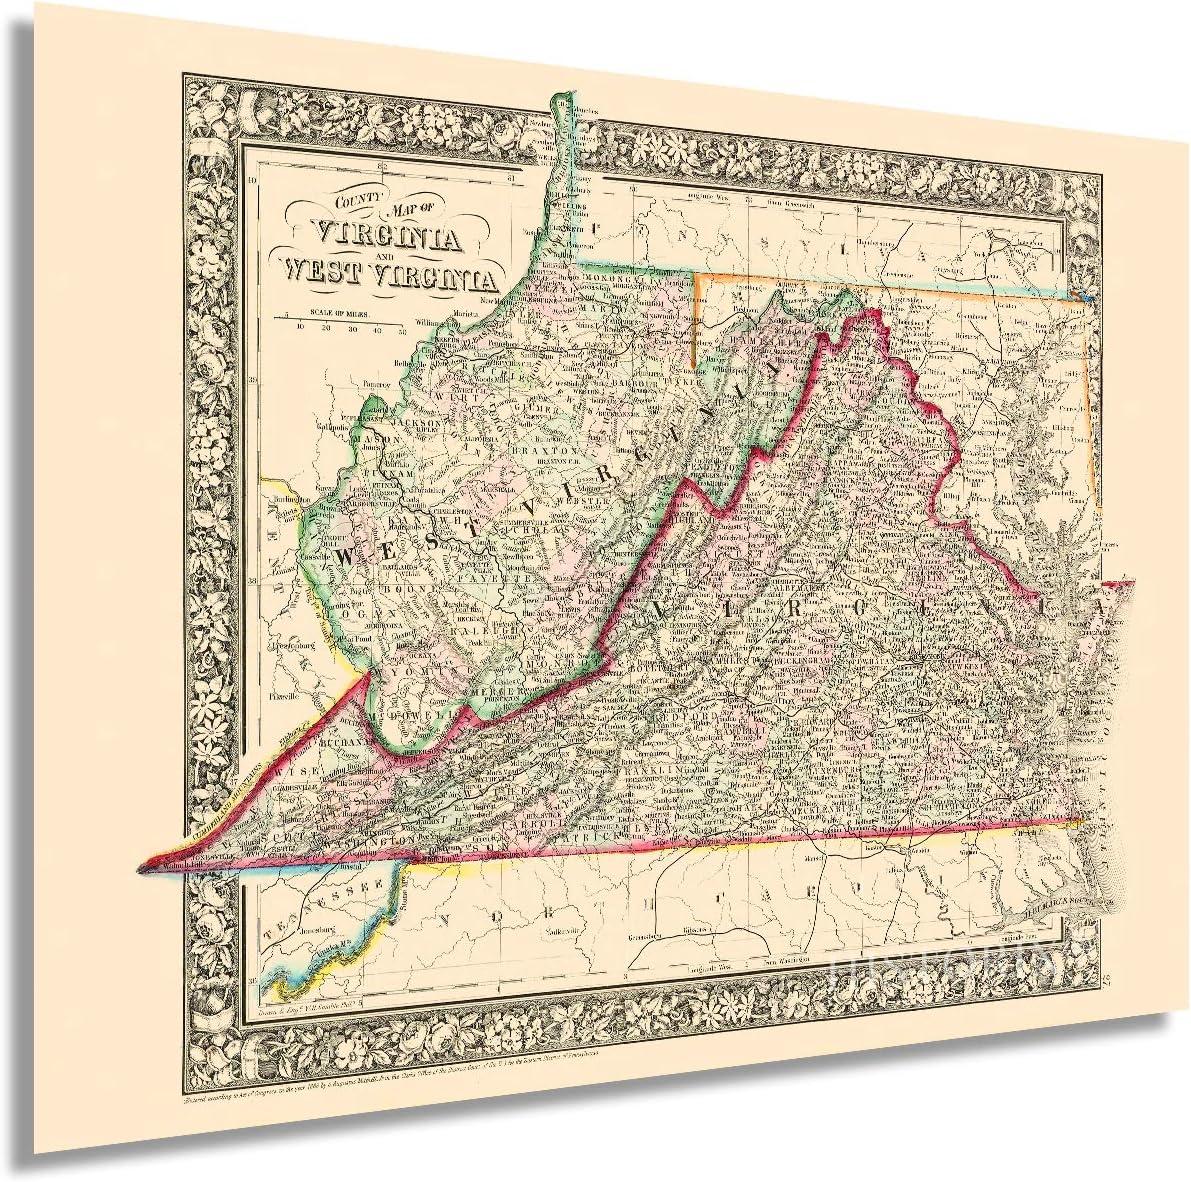 HISTORIX Vintage 1863 Virginia and West Virginia Map - 18x24 Inch Vintage Map of Virginia Poster and West Virginia Wall Map - Old County Map of Virginia and West Virginia (2 Sizes)